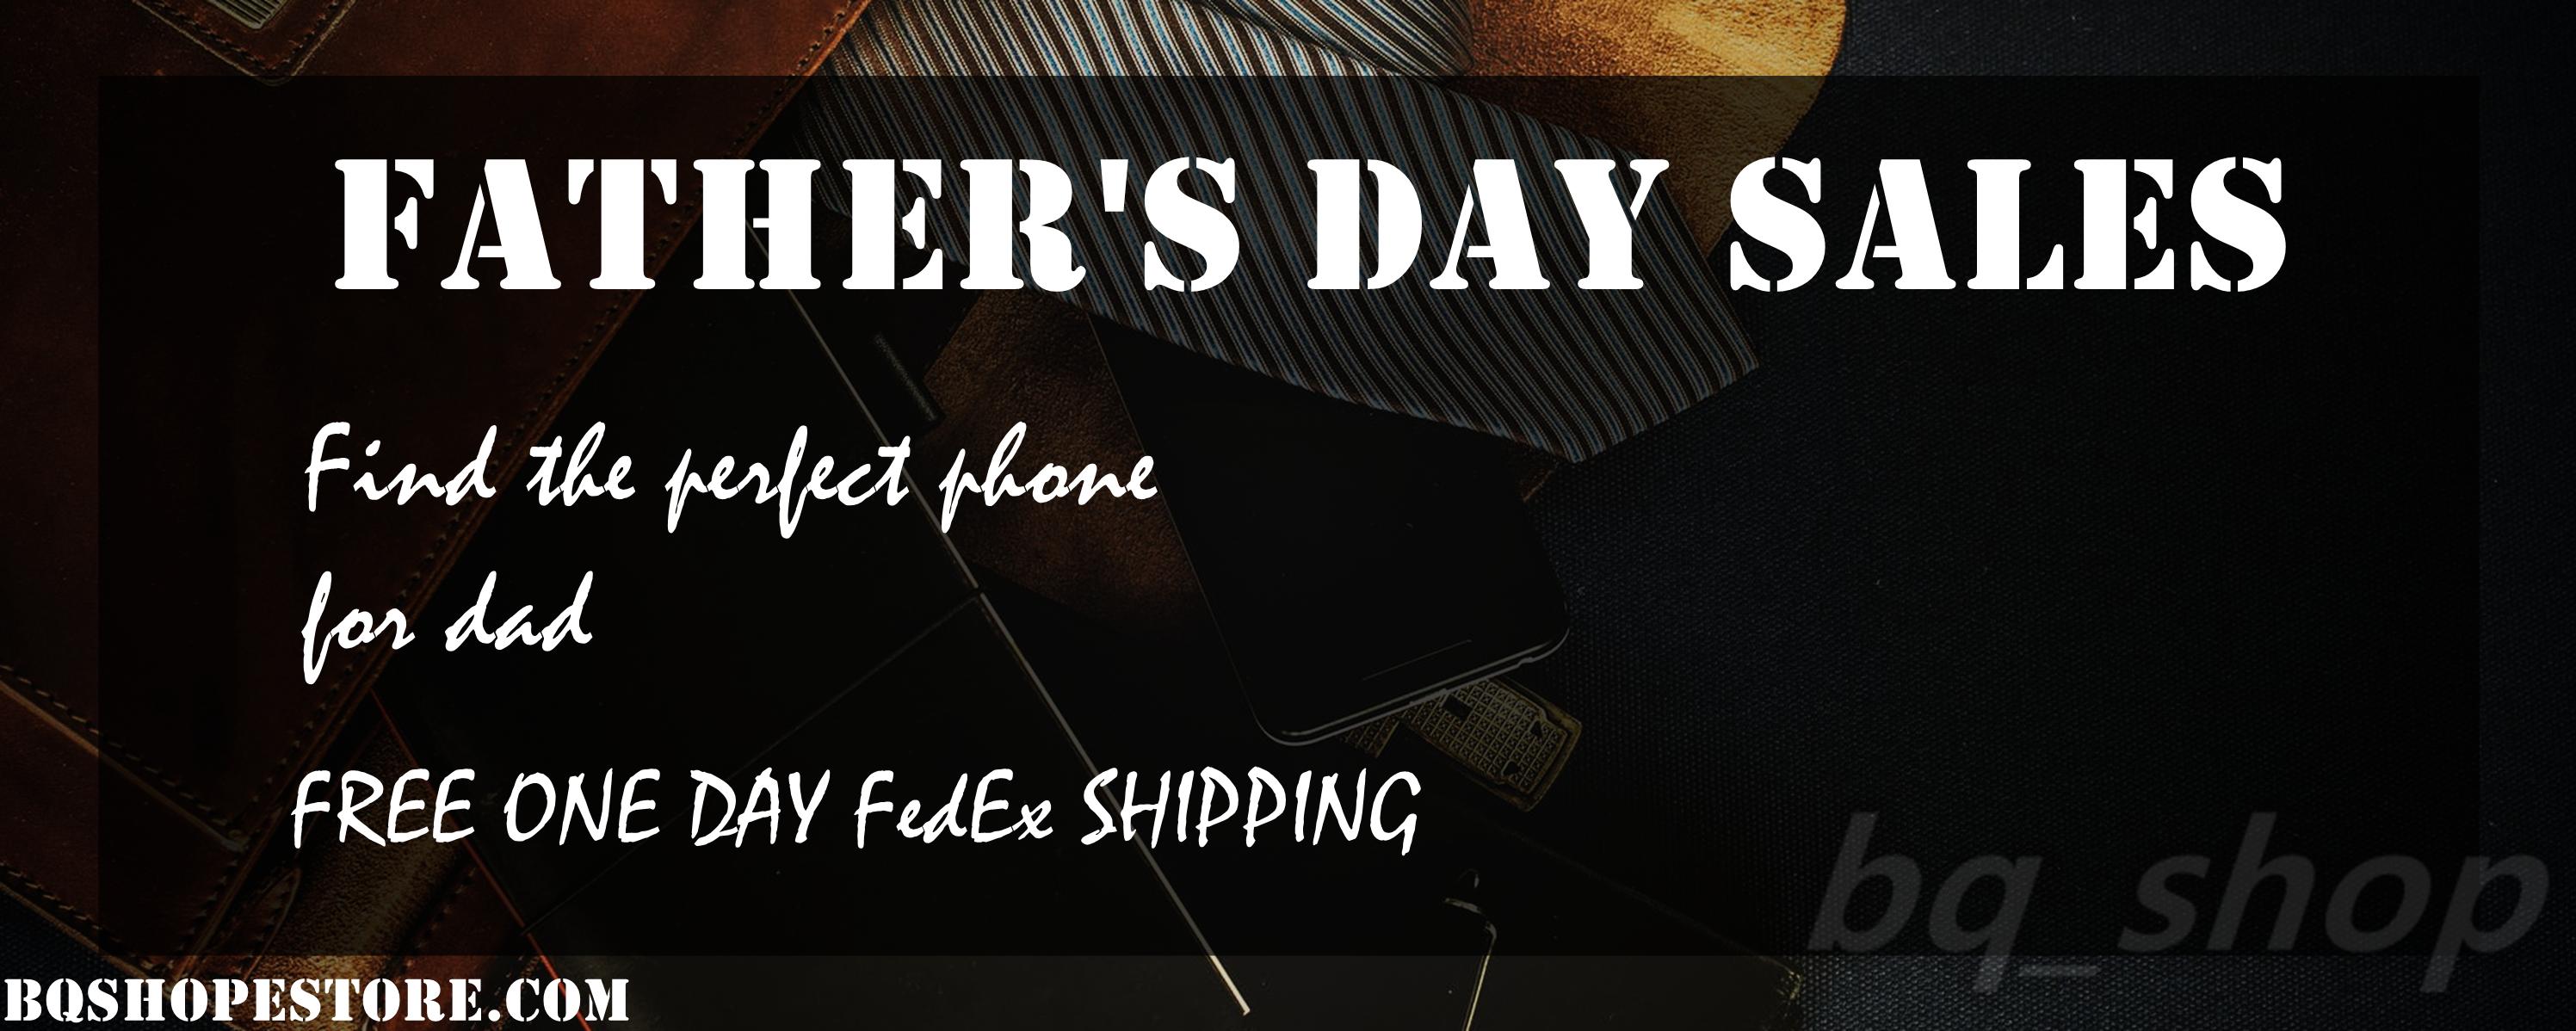 homepagecarousel-fatherday-sales2018-bqshopestore.com.png